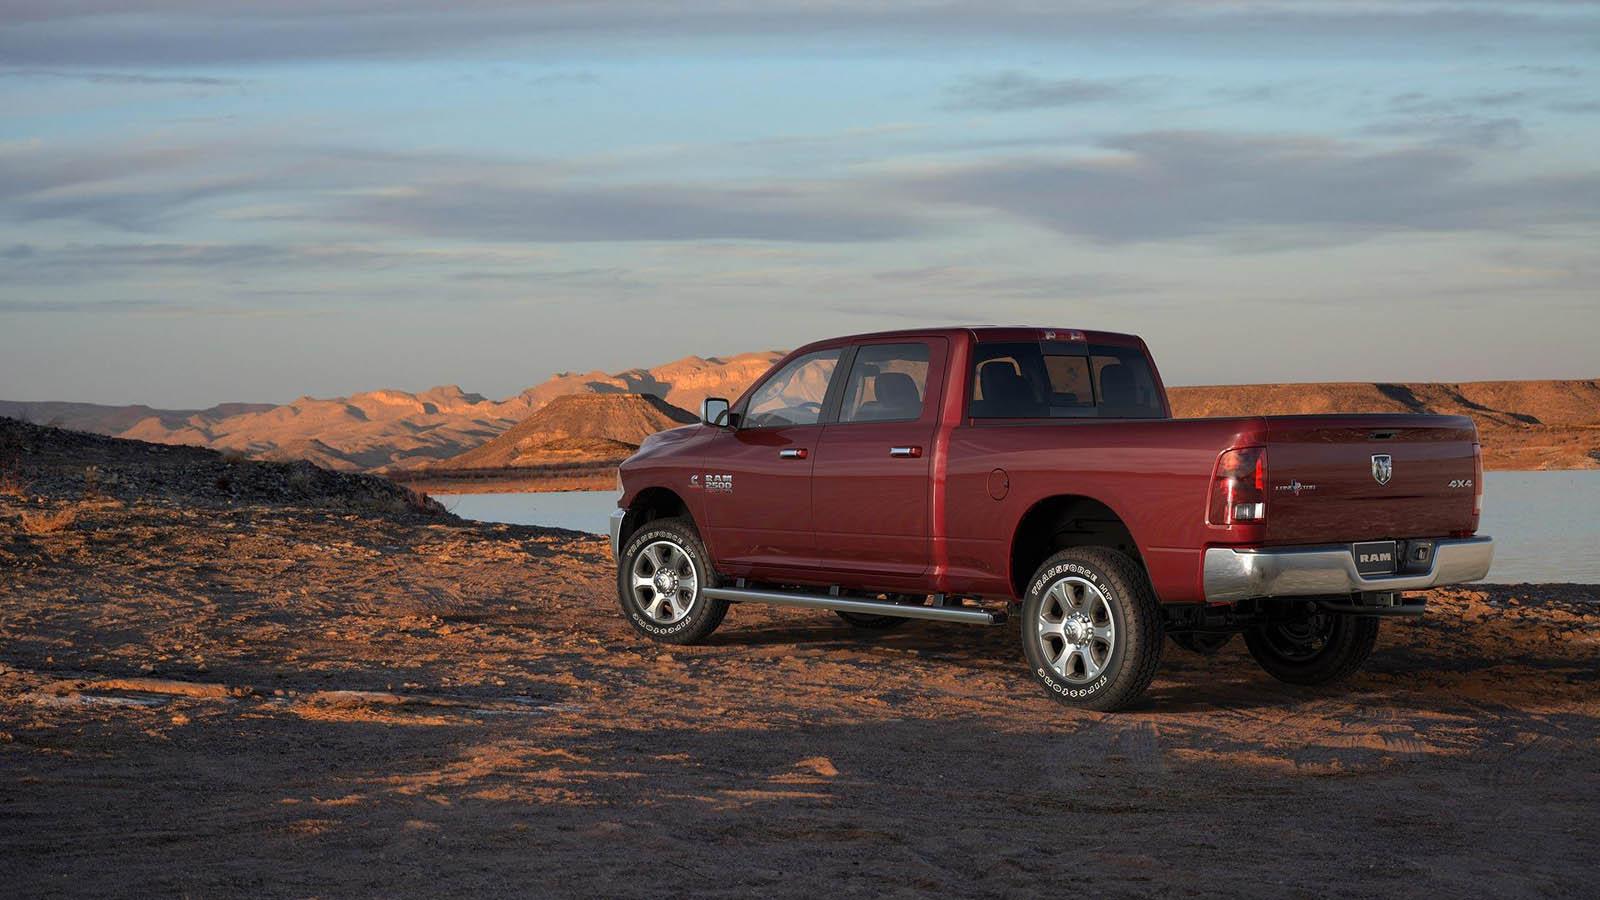 2018 Ram Pickup Truck Platform To Bring Forth SUV, Dakota